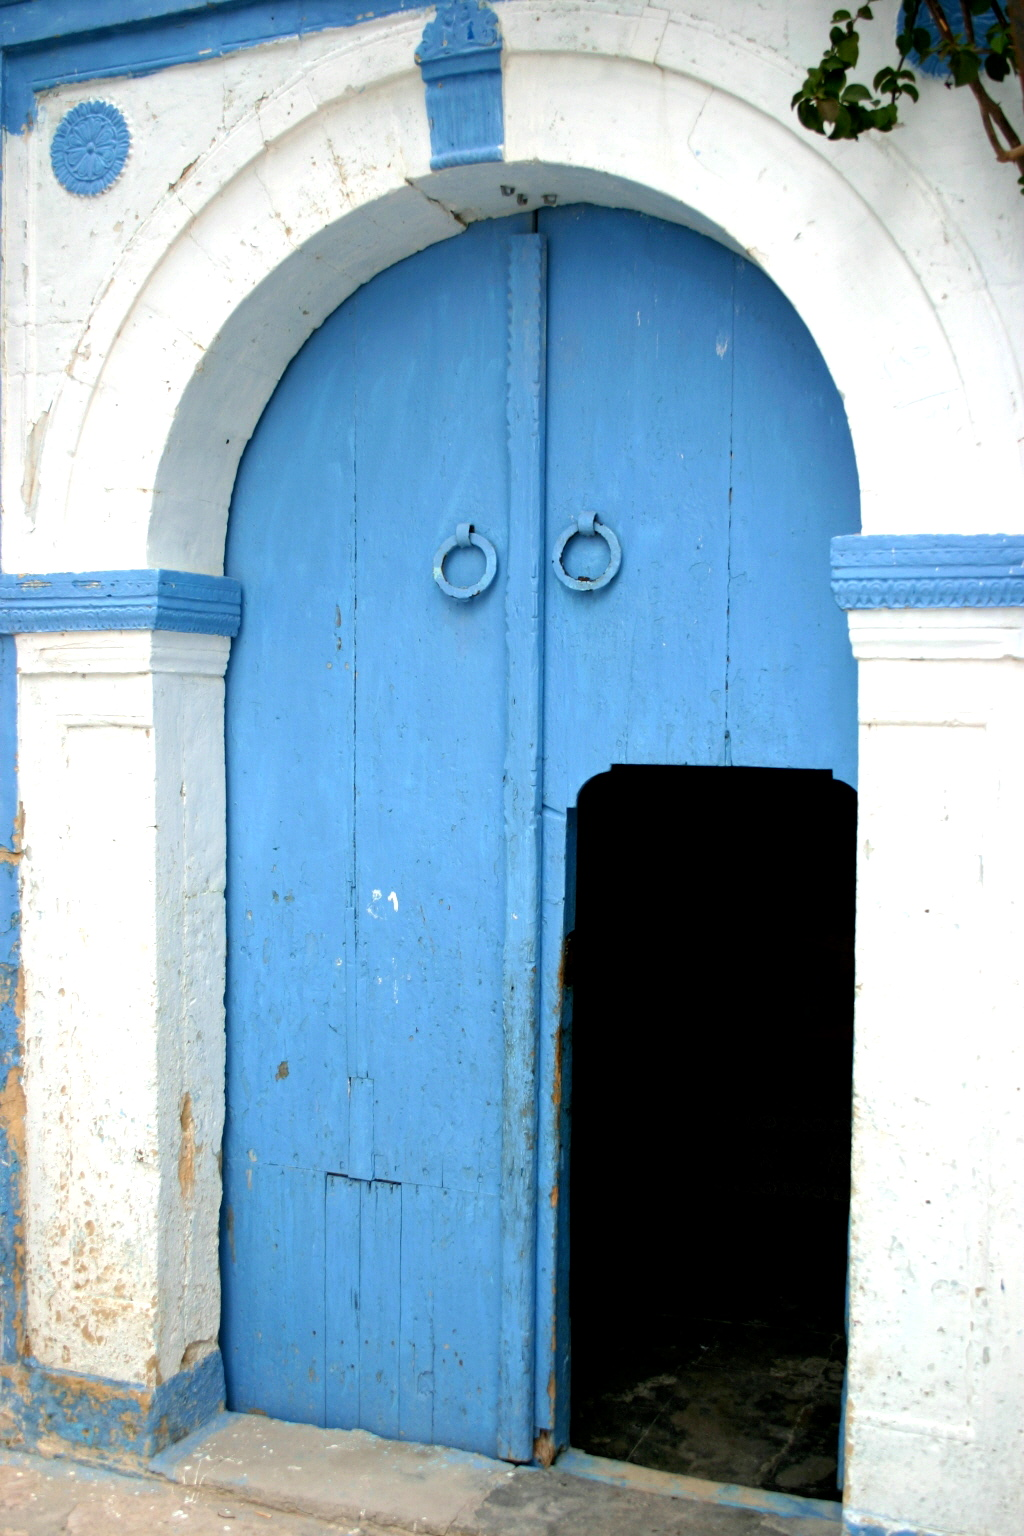 301 moved permanently for Porte de salon tunisie